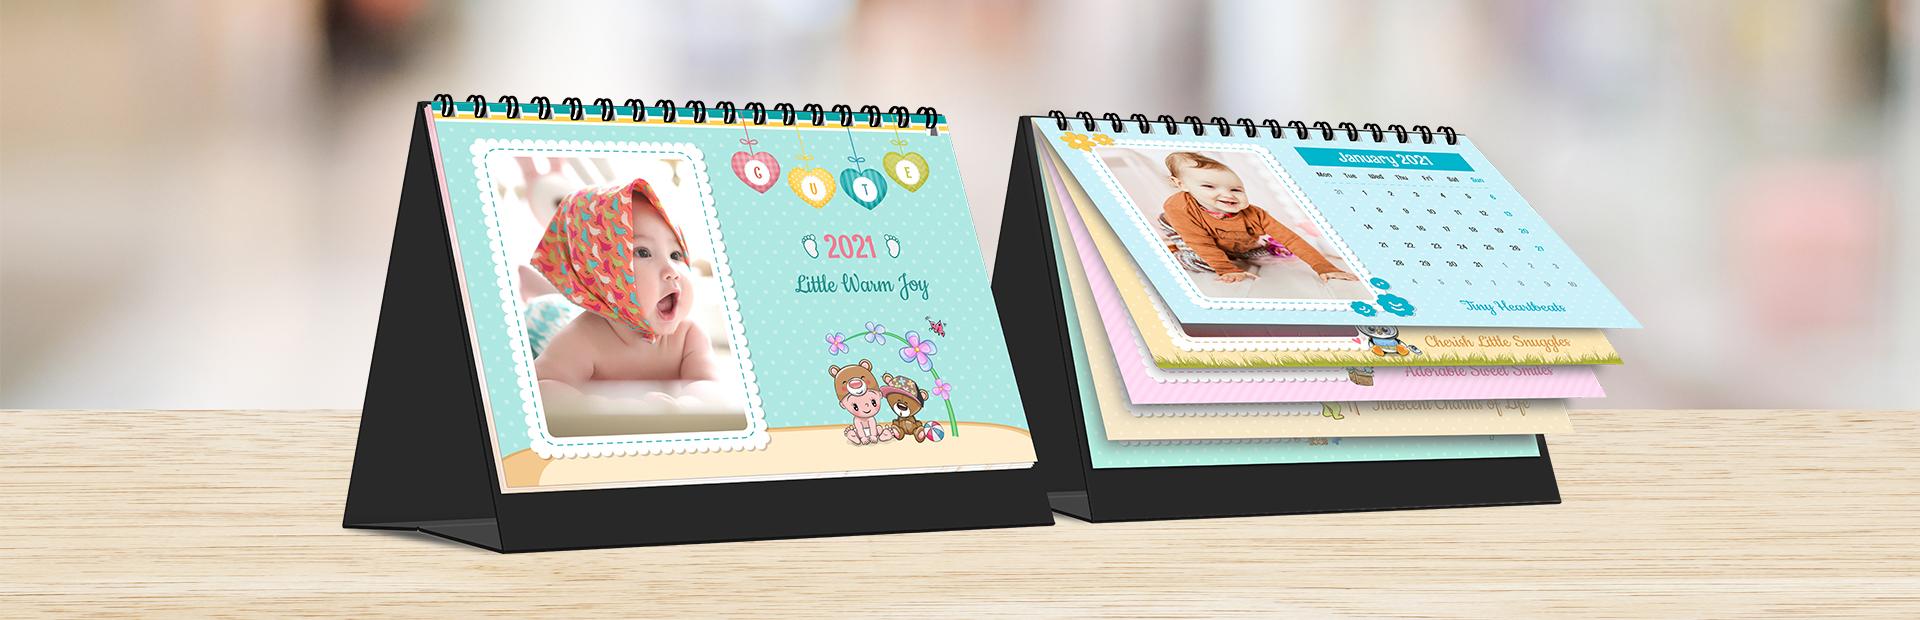 Baby Joy Photo Calendars Online